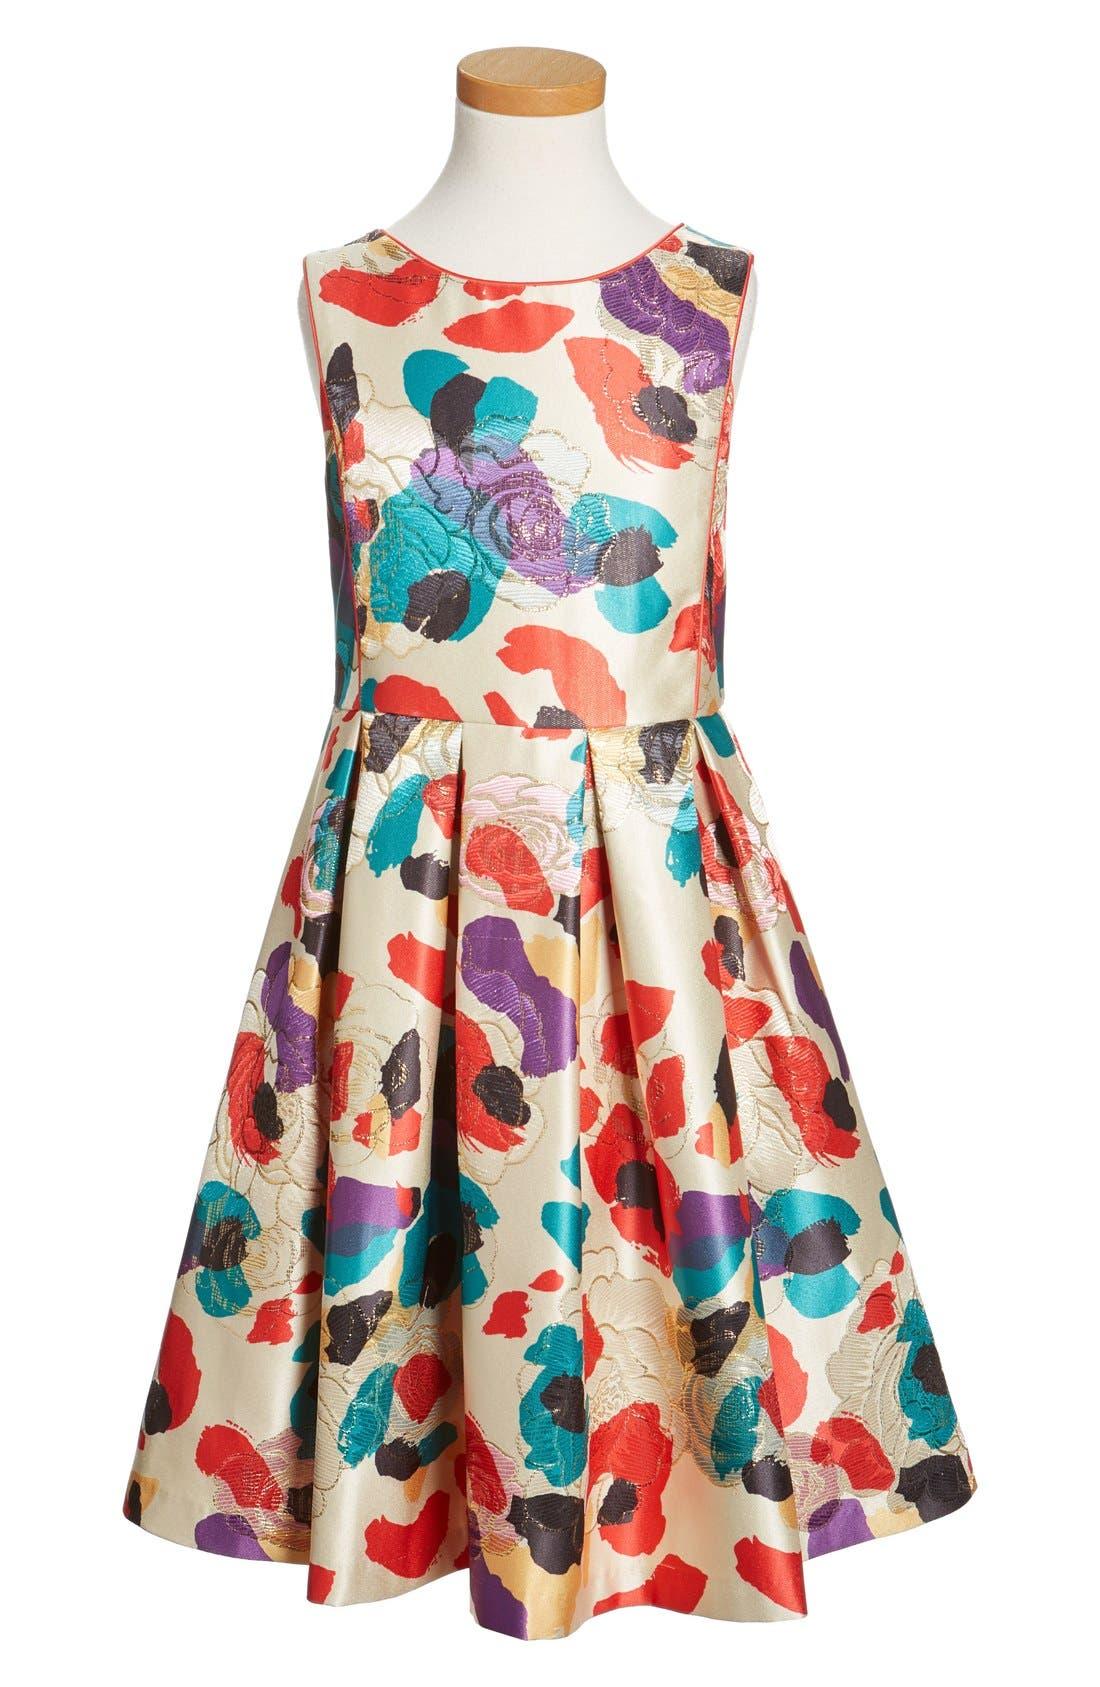 Watercolor Floral Brocade Dress,                             Main thumbnail 1, color,                             Multi Red